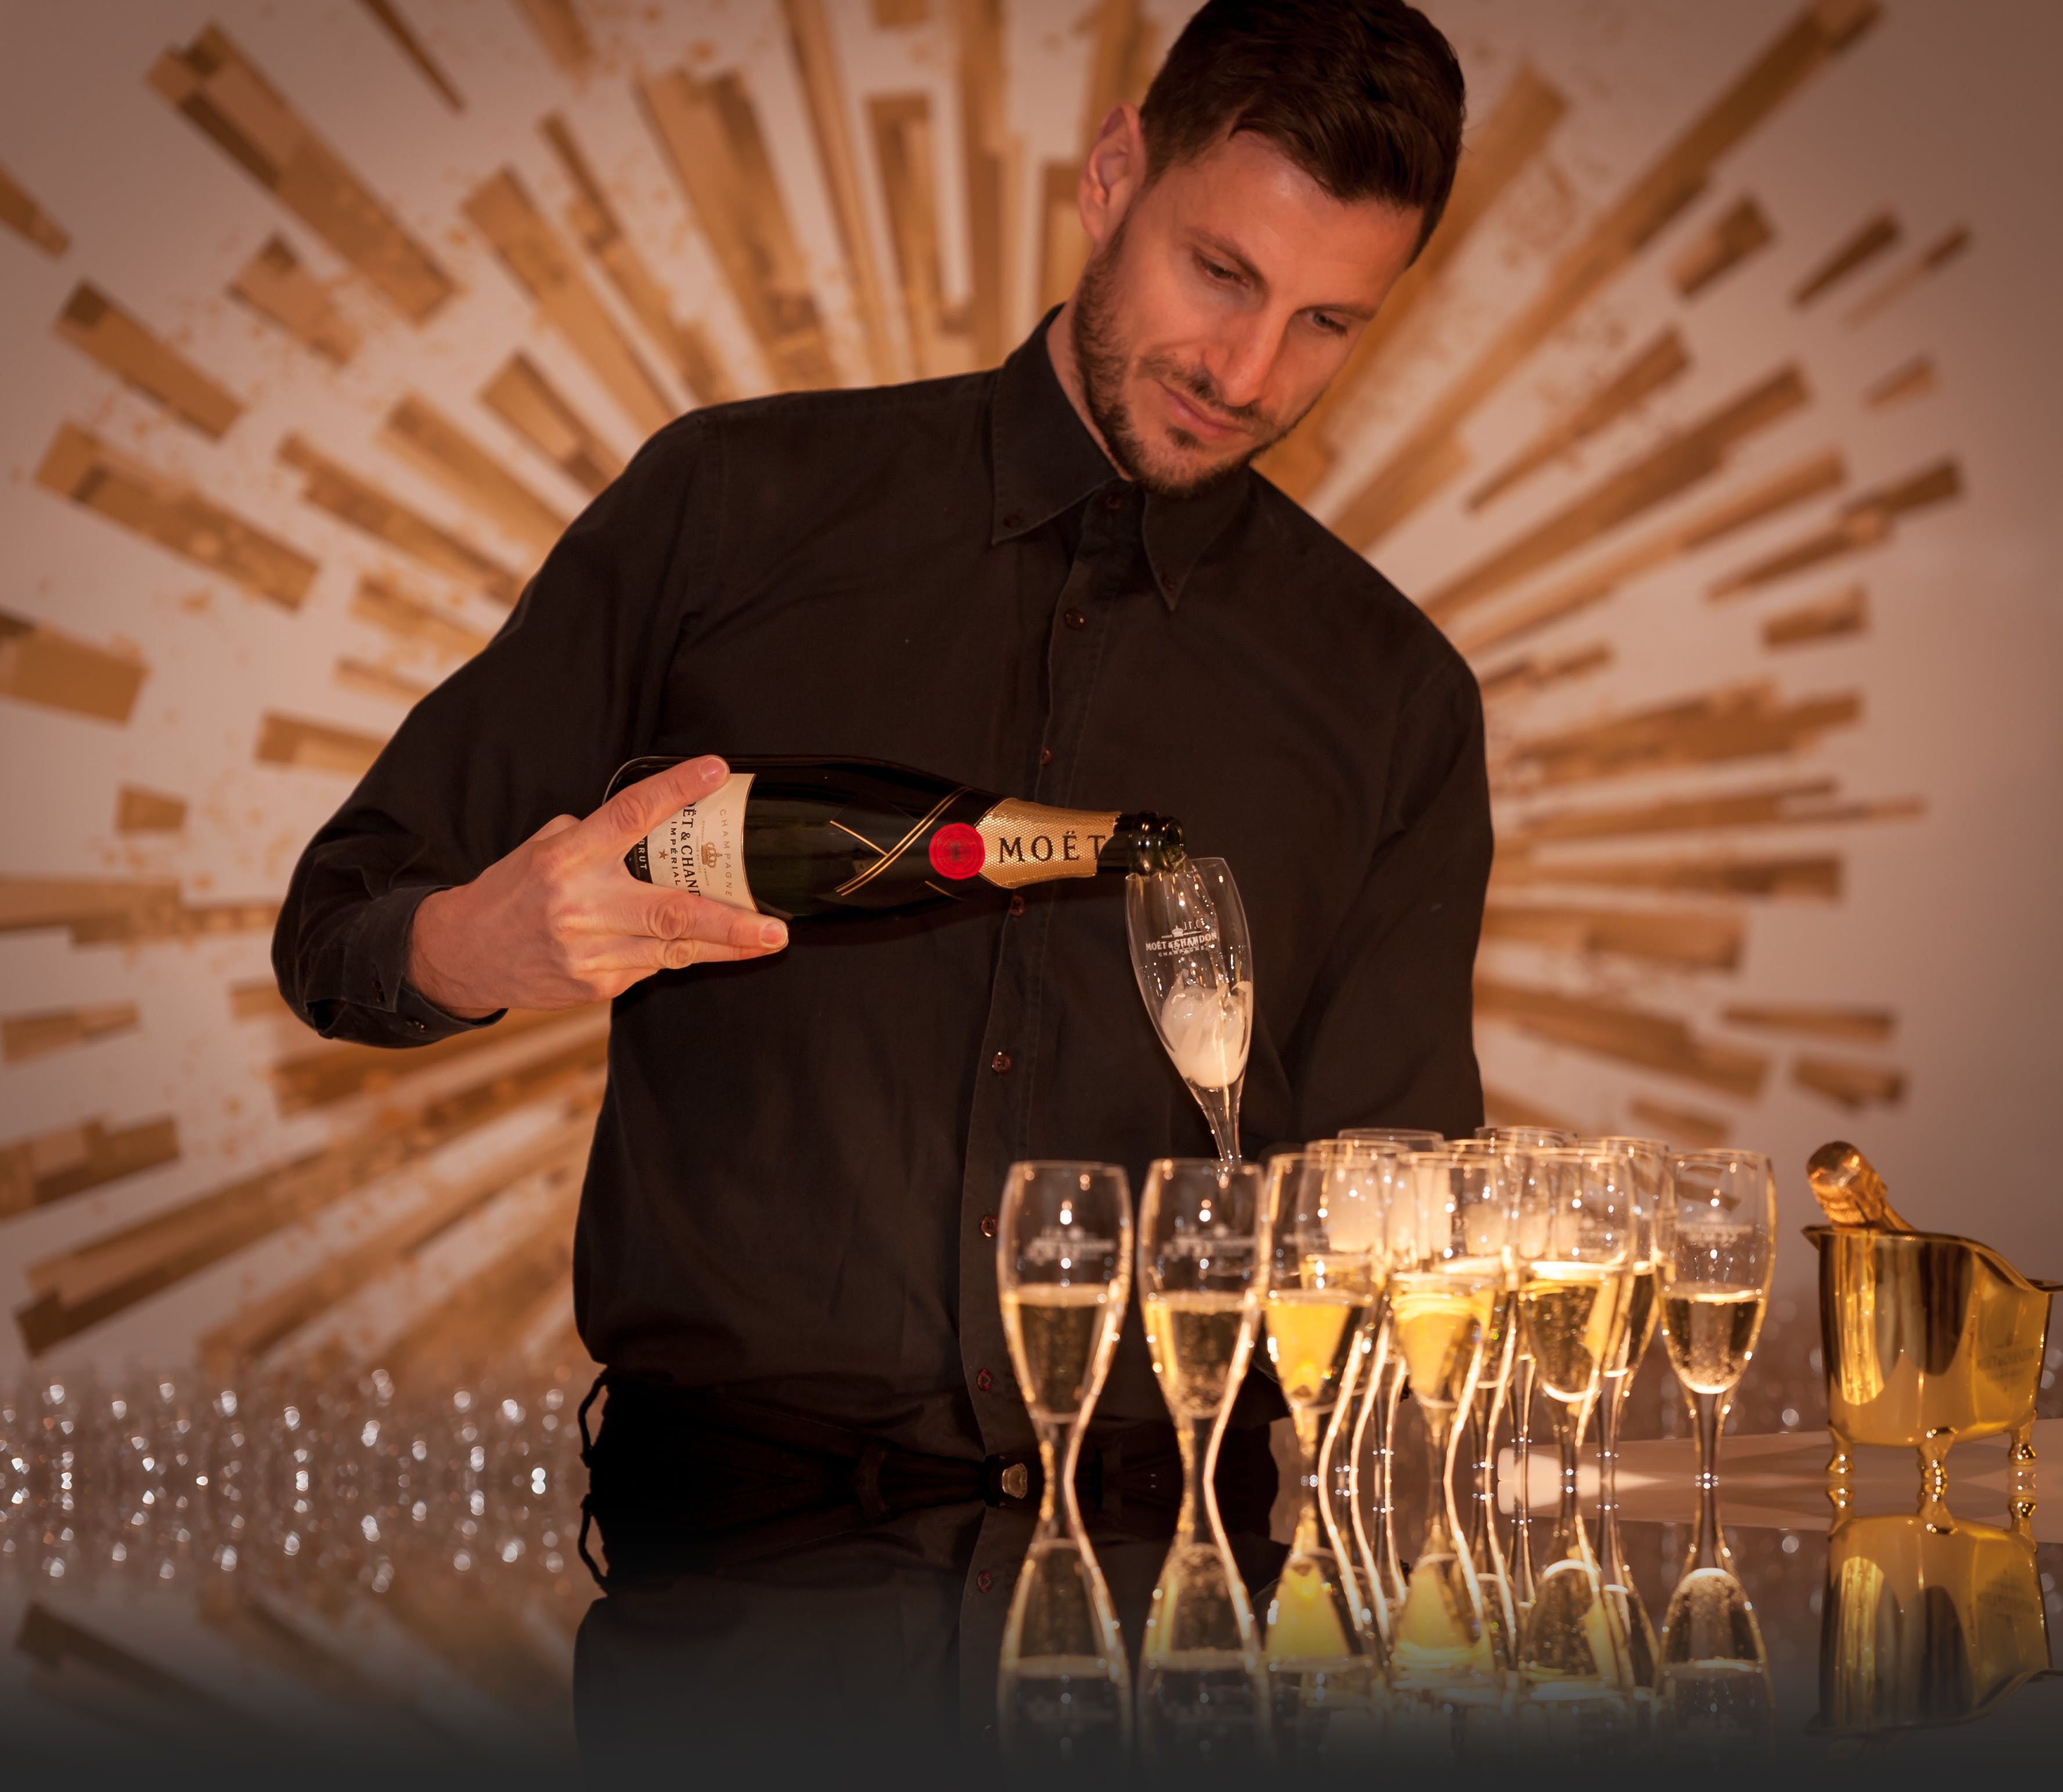 Man Wearing Black Dress Shirt Holding a Flute Glass and Black Wine Bottle